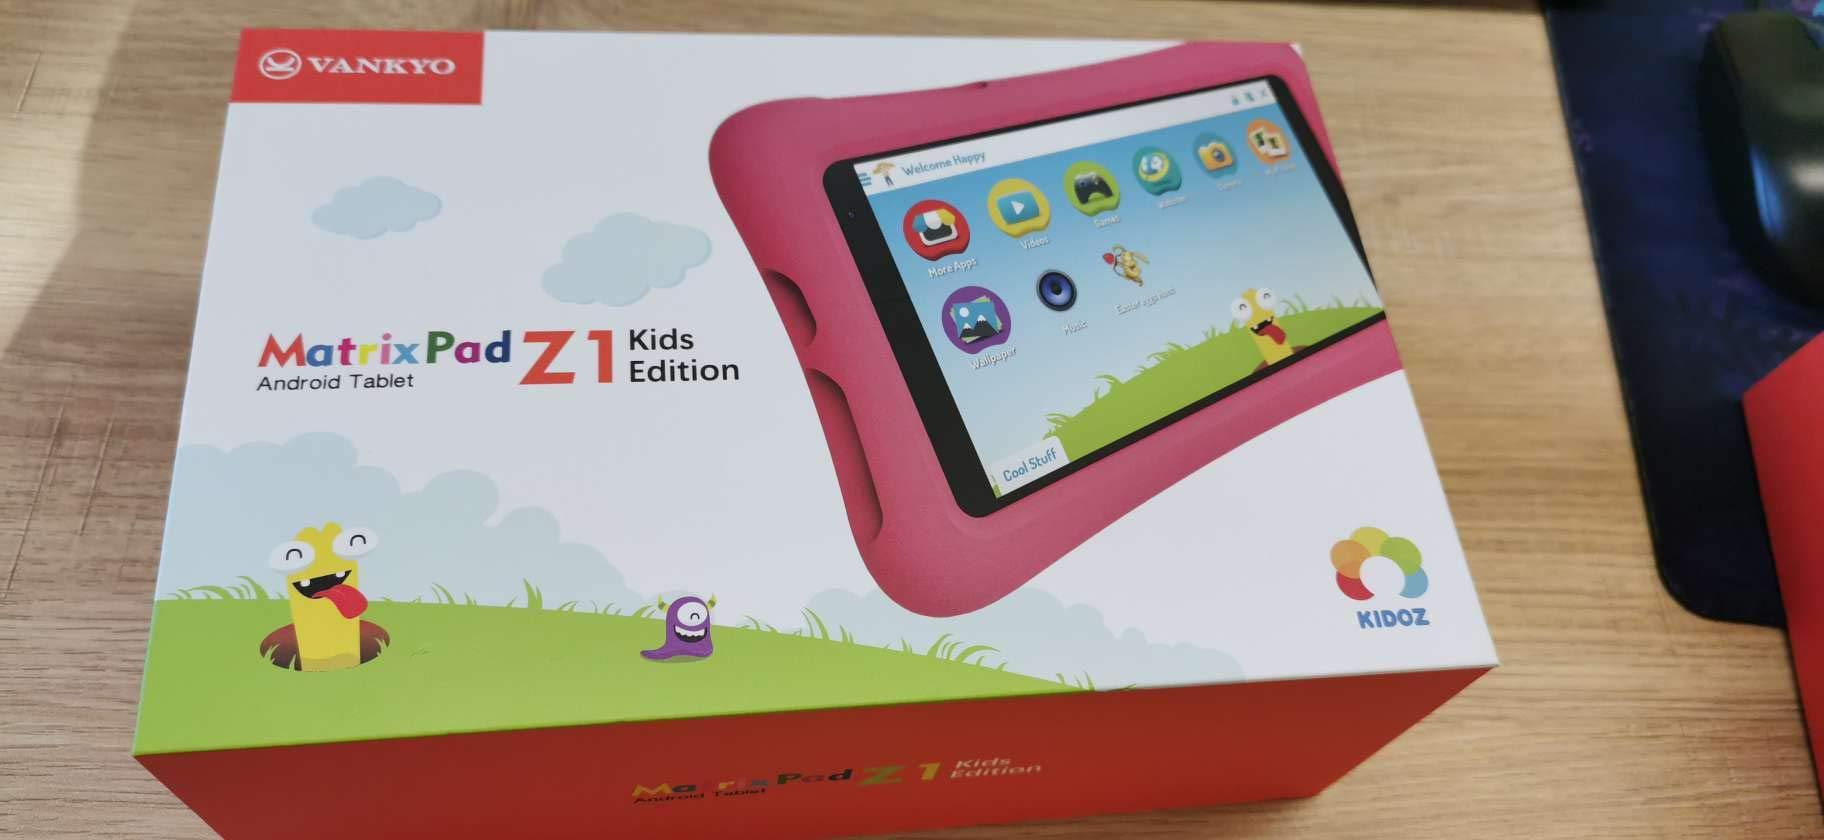 Vankyo MatrixPad Z1 Kids Tablet 7 inch, 32GB ROM, Kidoz Pre Installed, IPS HD Display, WiFi Android Tablet, Kid-Proof Case, Pink by vankyo